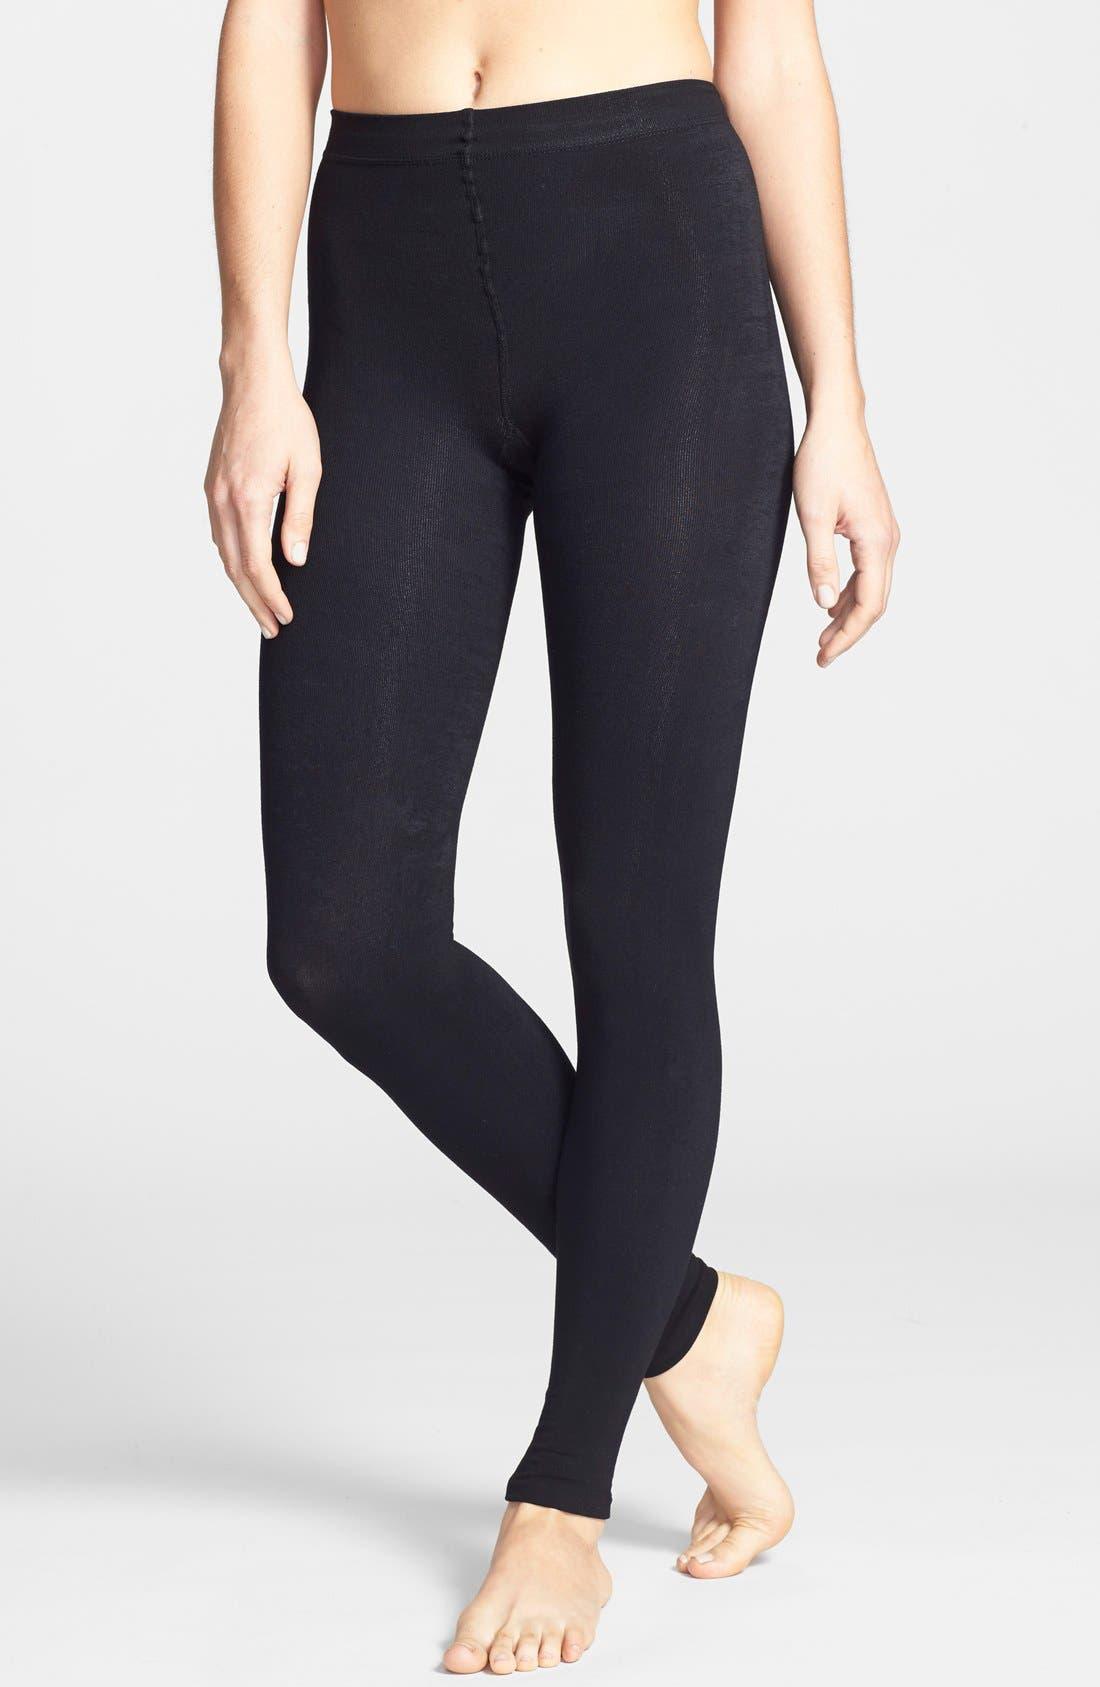 Donna Karan 'Luxe Layer' Leggings,                             Main thumbnail 1, color,                             Black